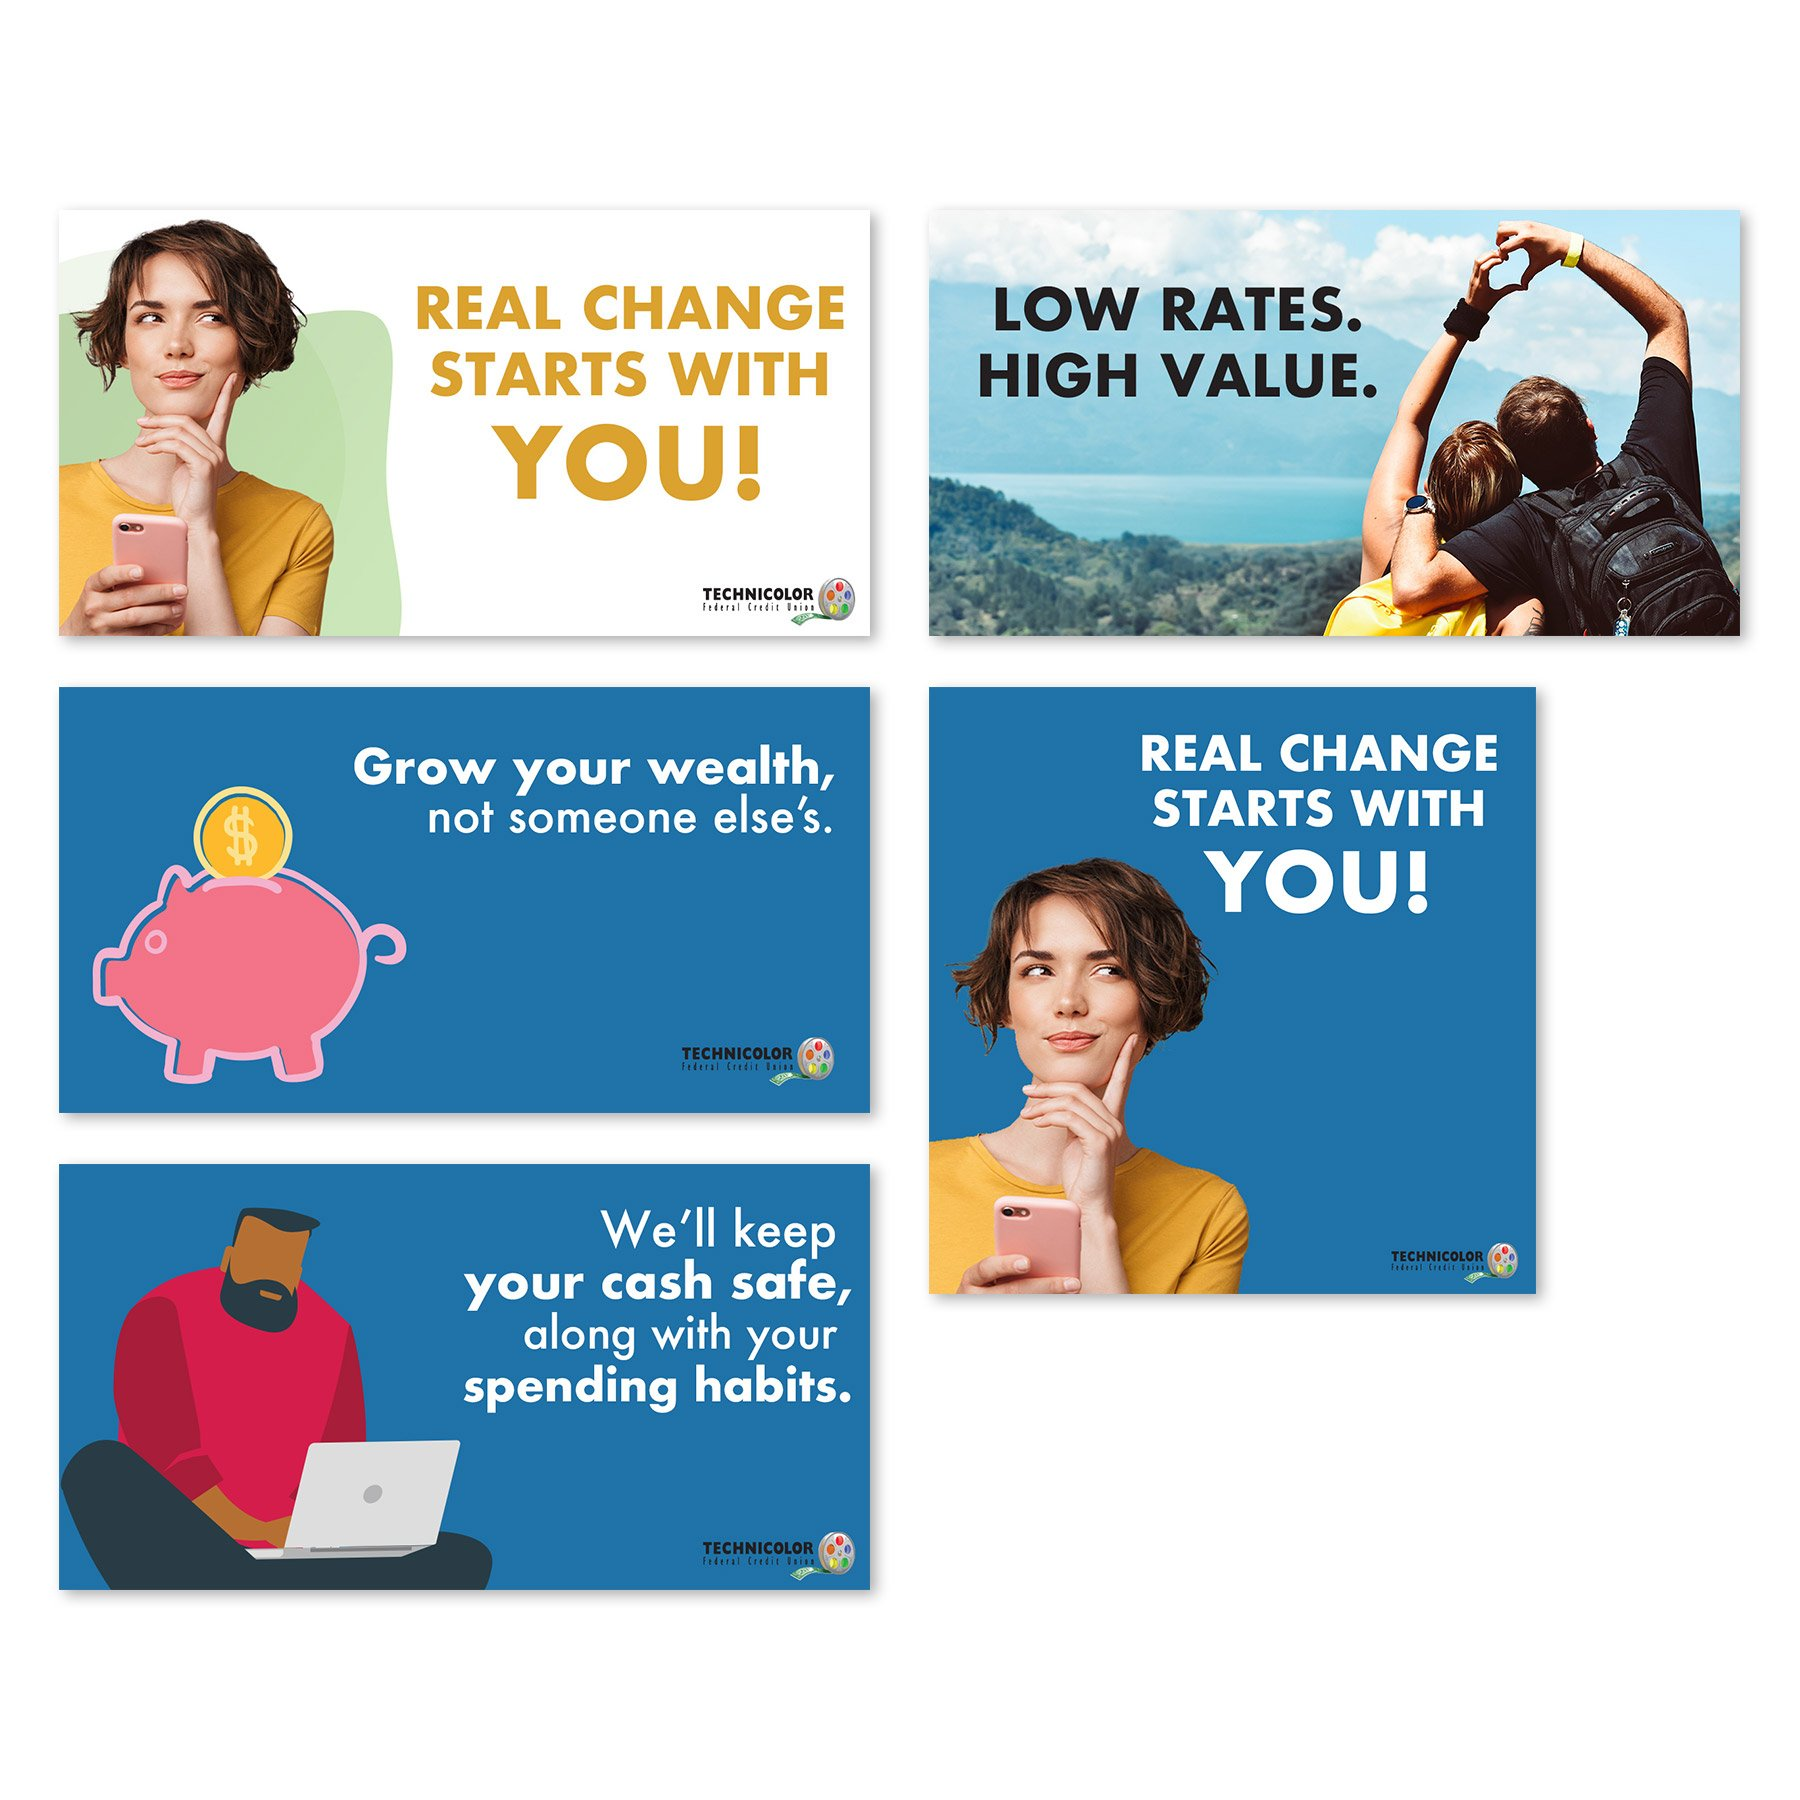 Technicolor Credit Union Social Media Ads